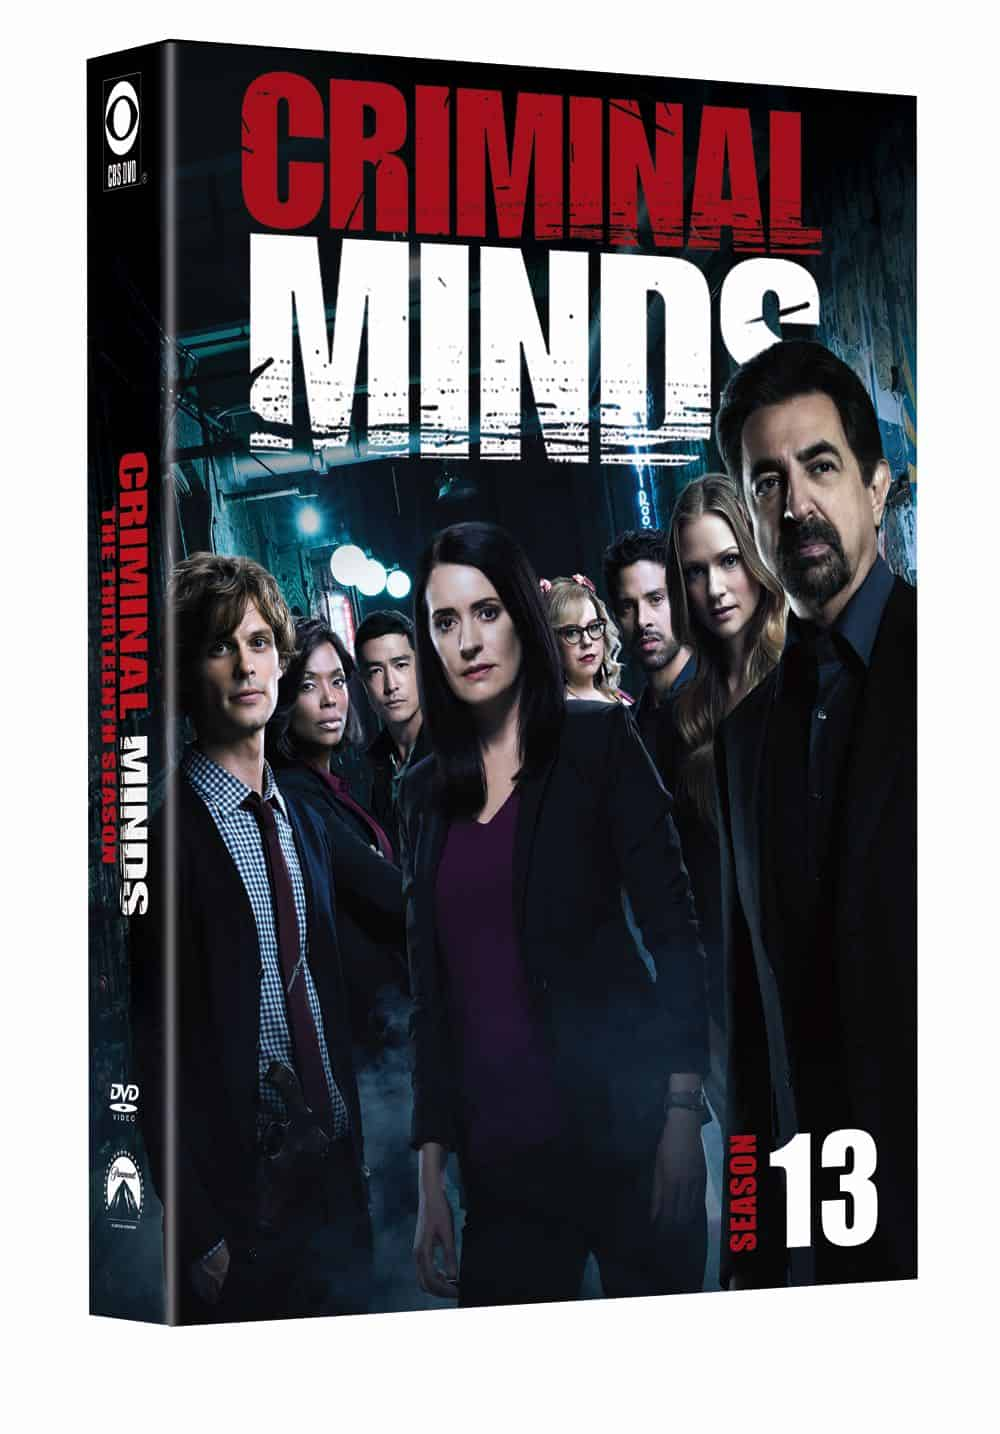 Criminal Minds Season 13 DVD Cover 1